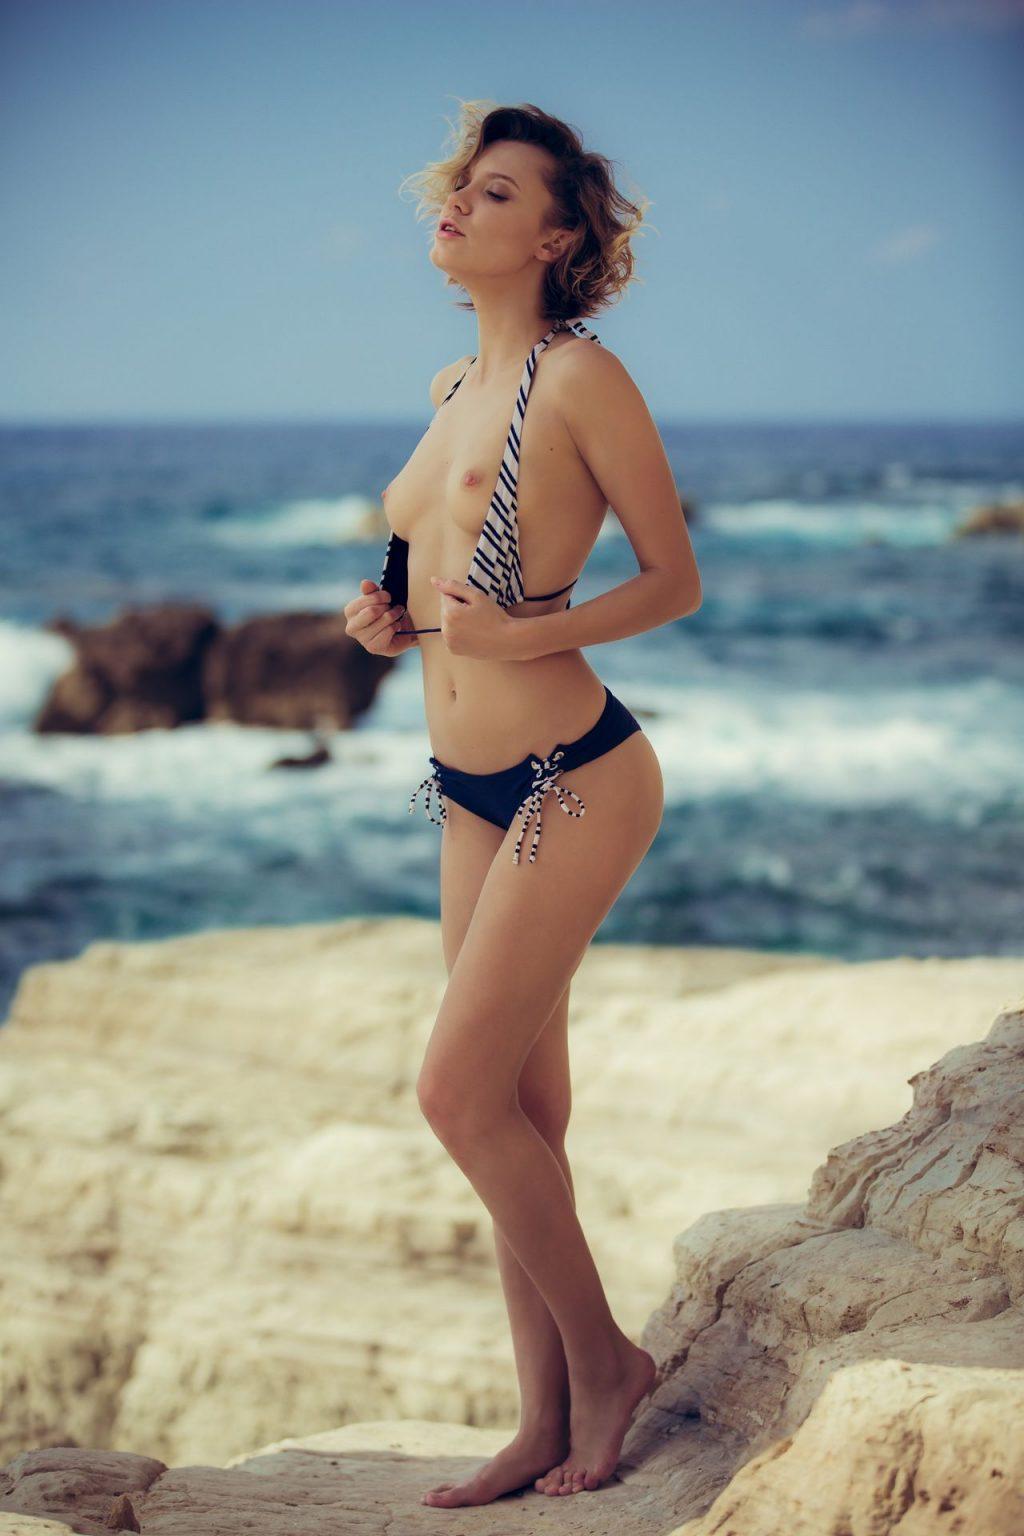 Oksana Chucha Nude – Seacoast Smiles (40 Photos + GIFs & Video)